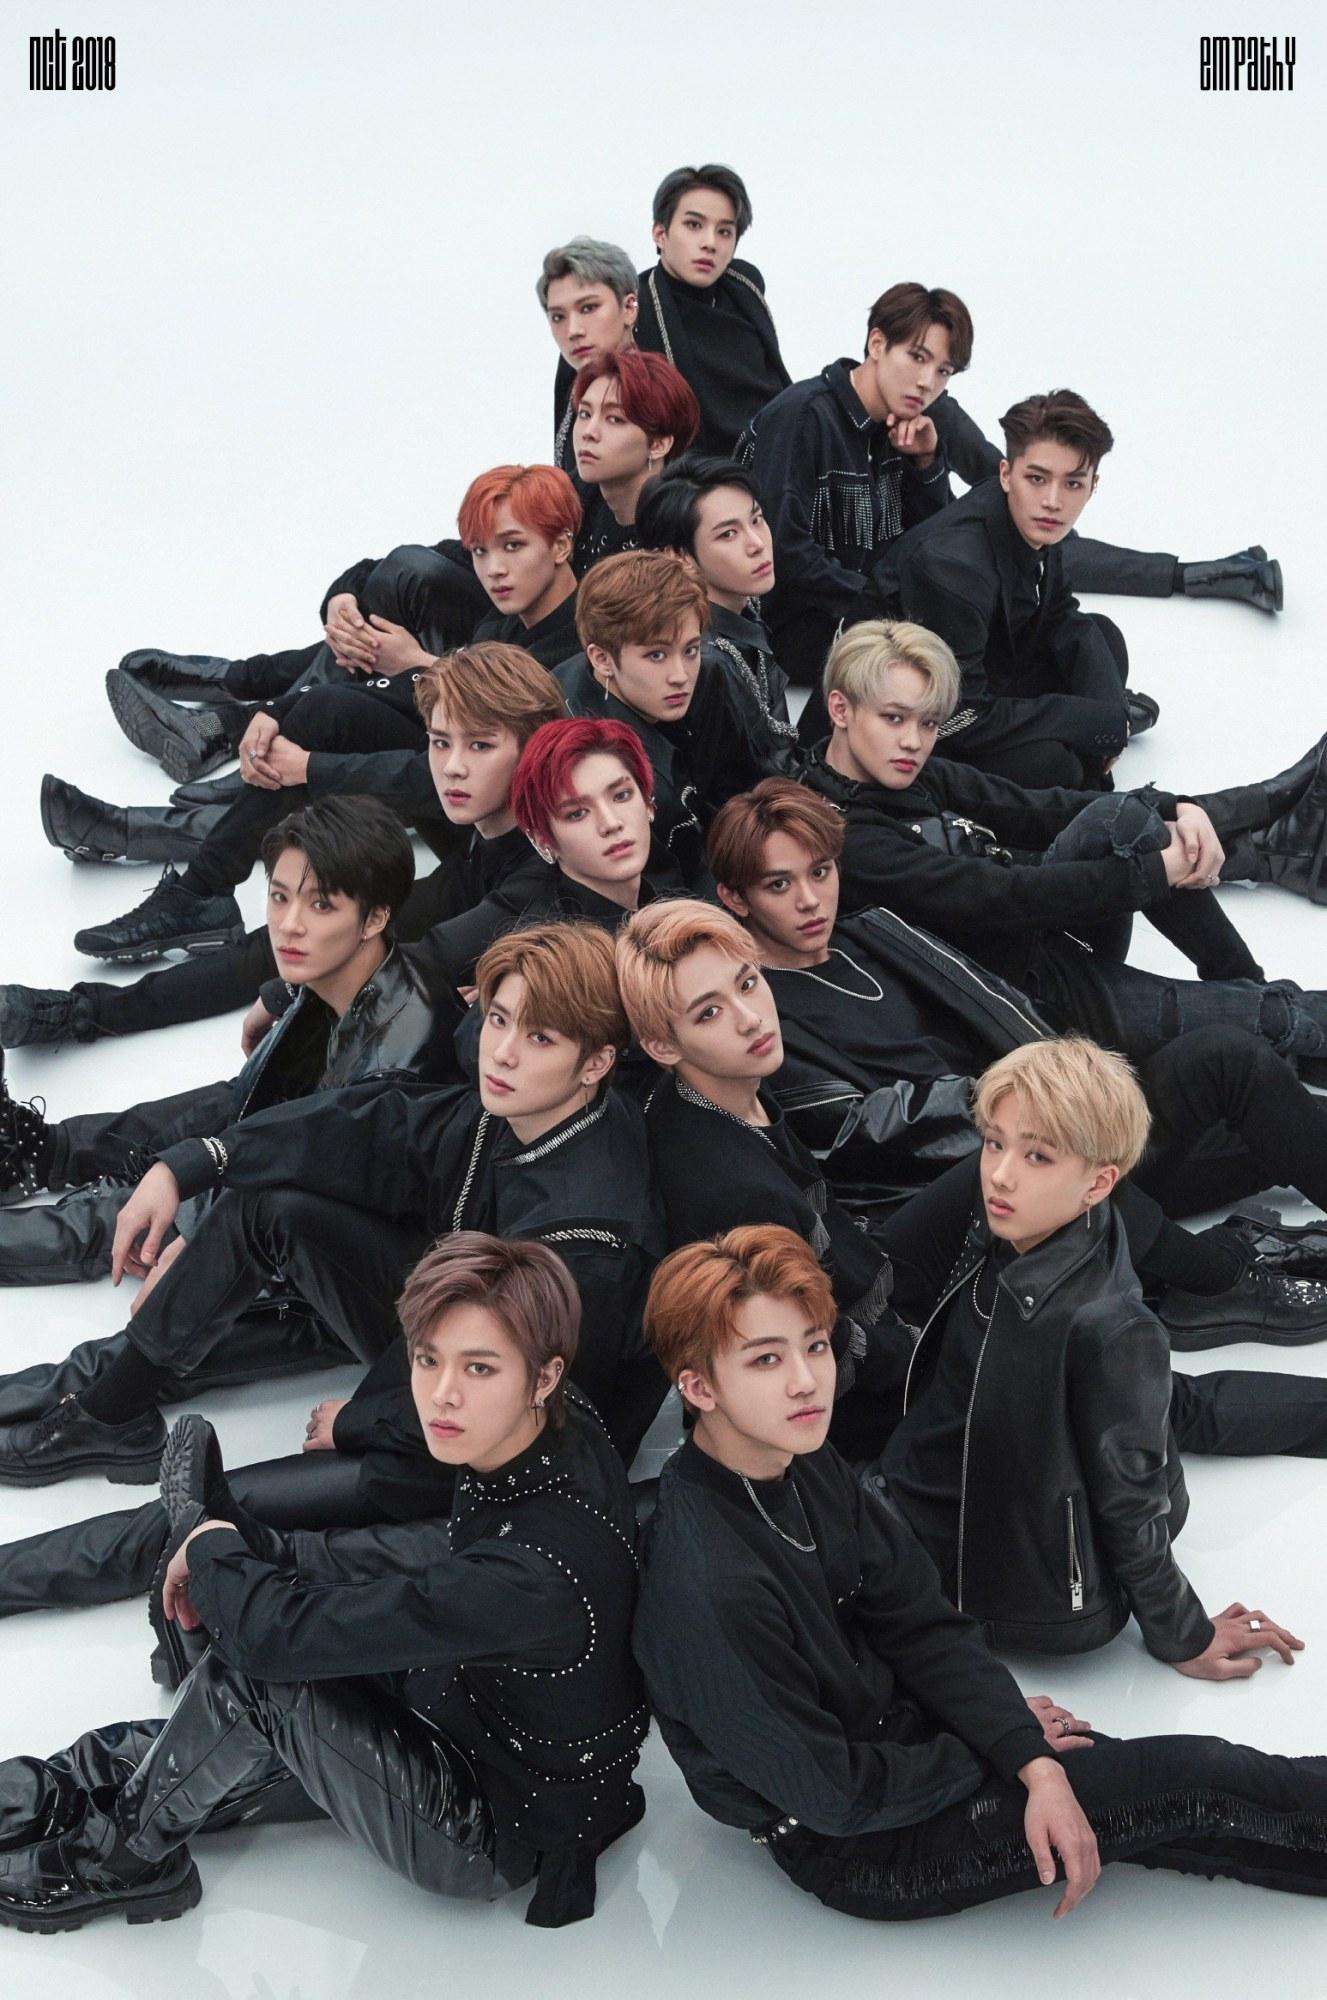 Kpop groupe rencontres